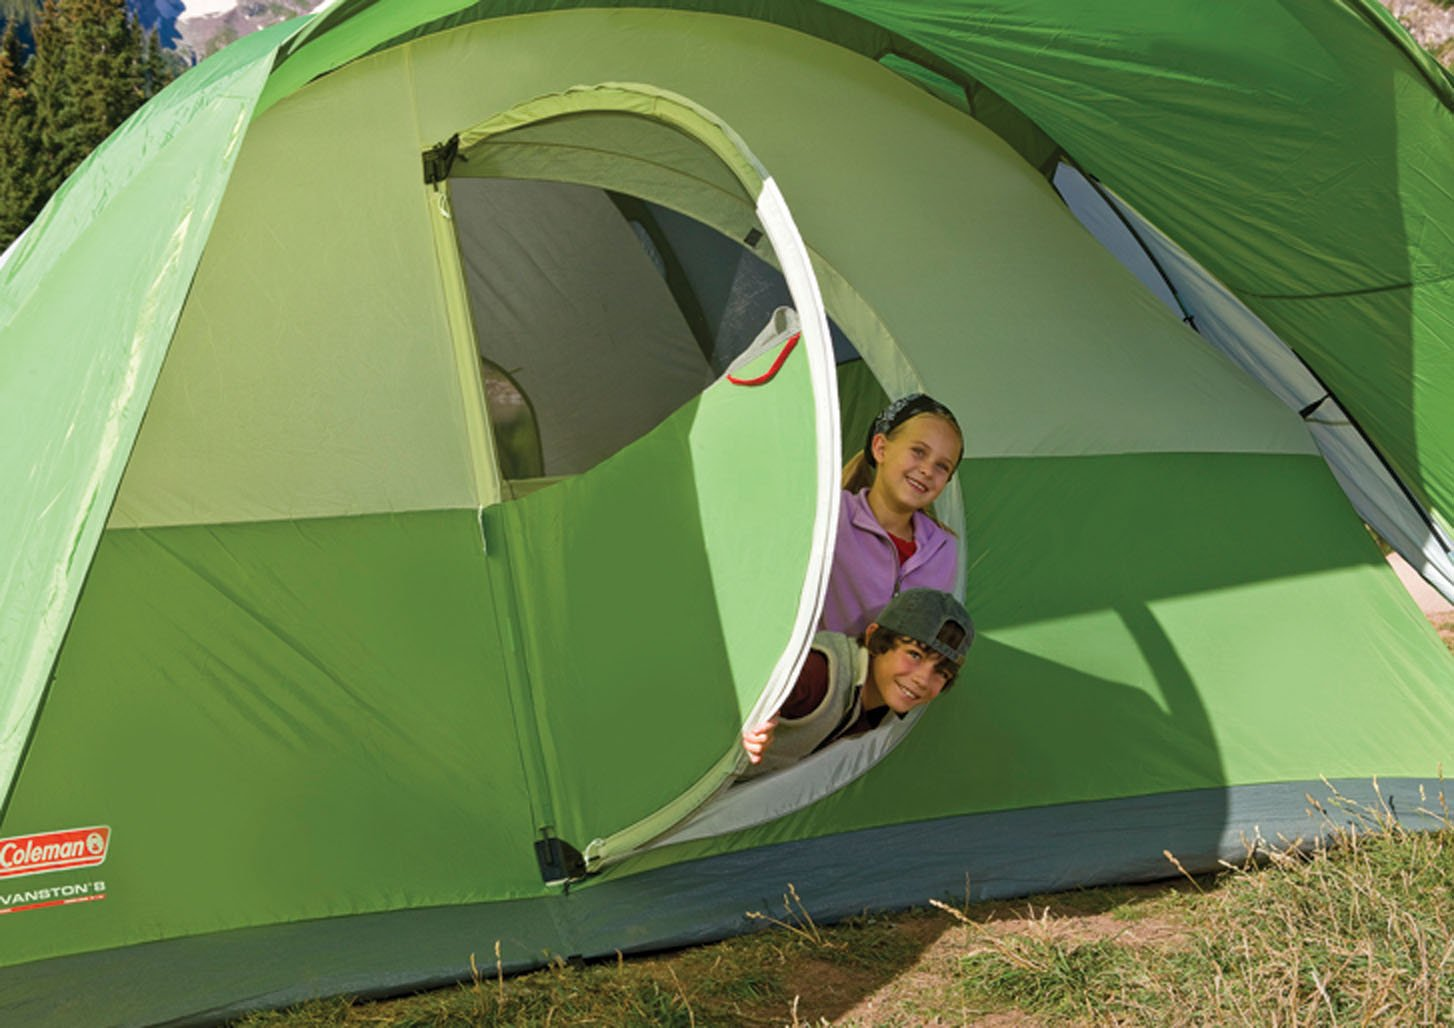 Coleman MontanaCamping Tent Black Friday 2019 Deals